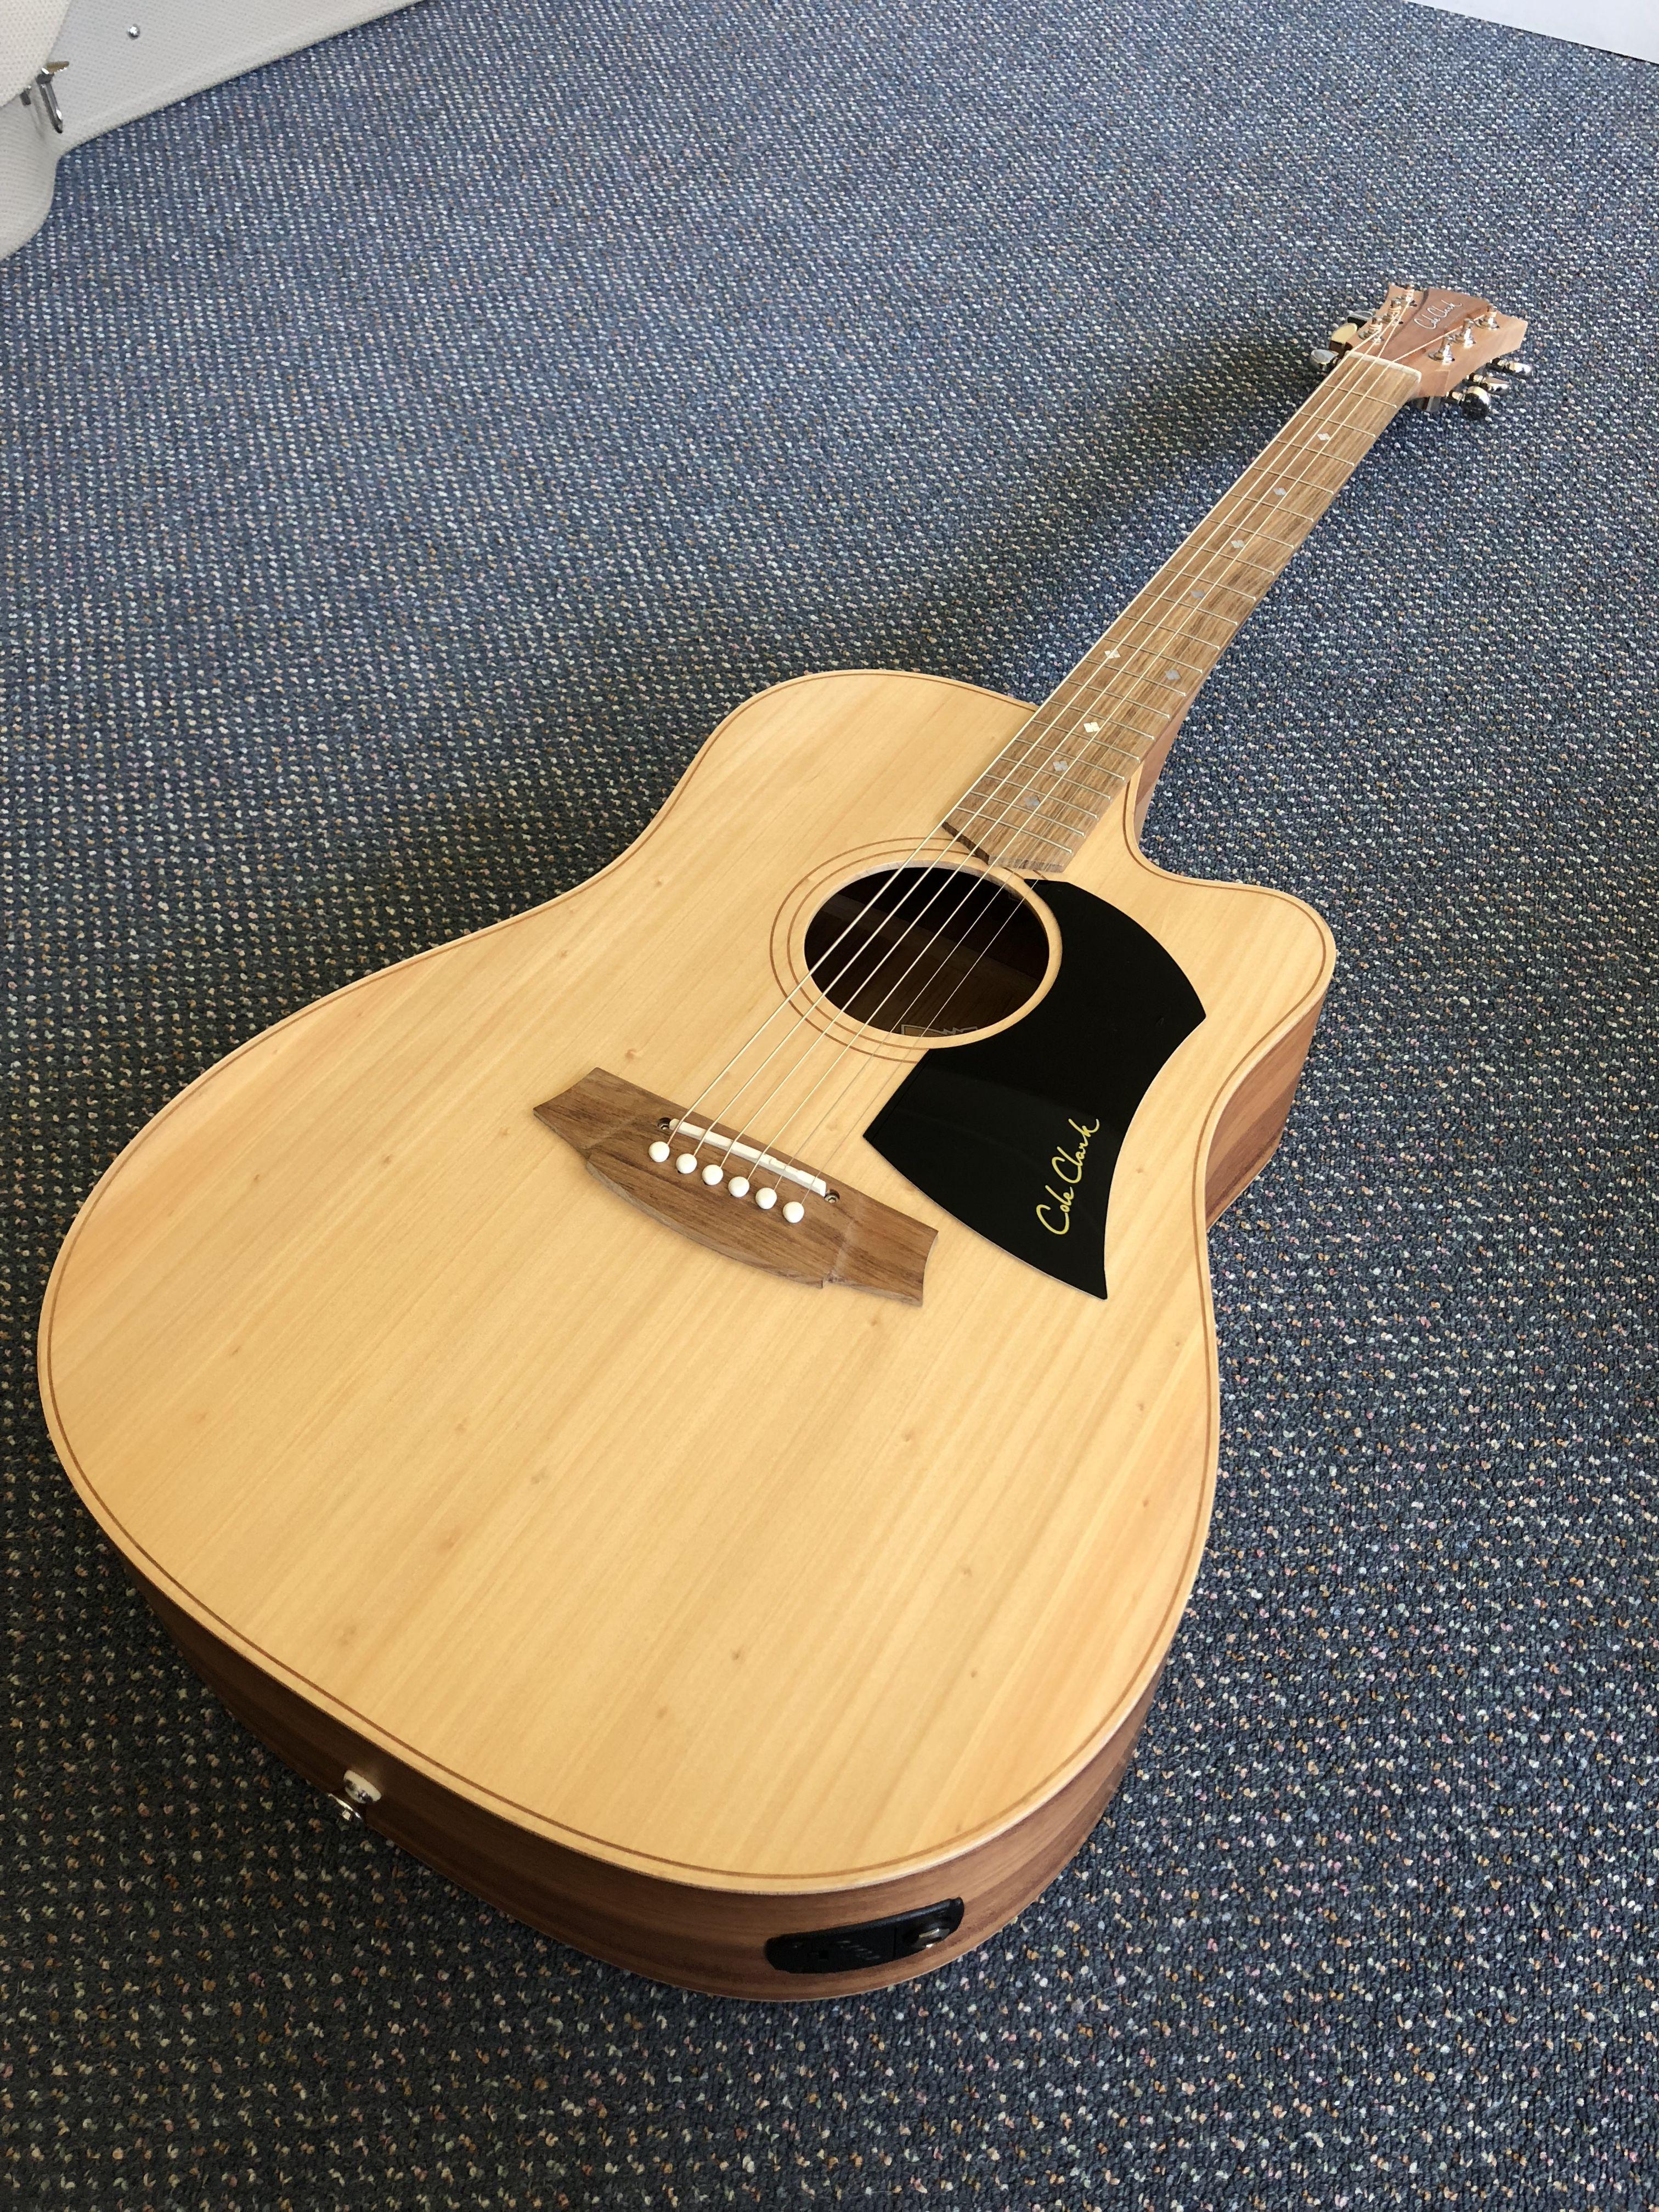 Cole Clark Acoustic Guitar Guitar Gadgets Guitar Guitar Lovers